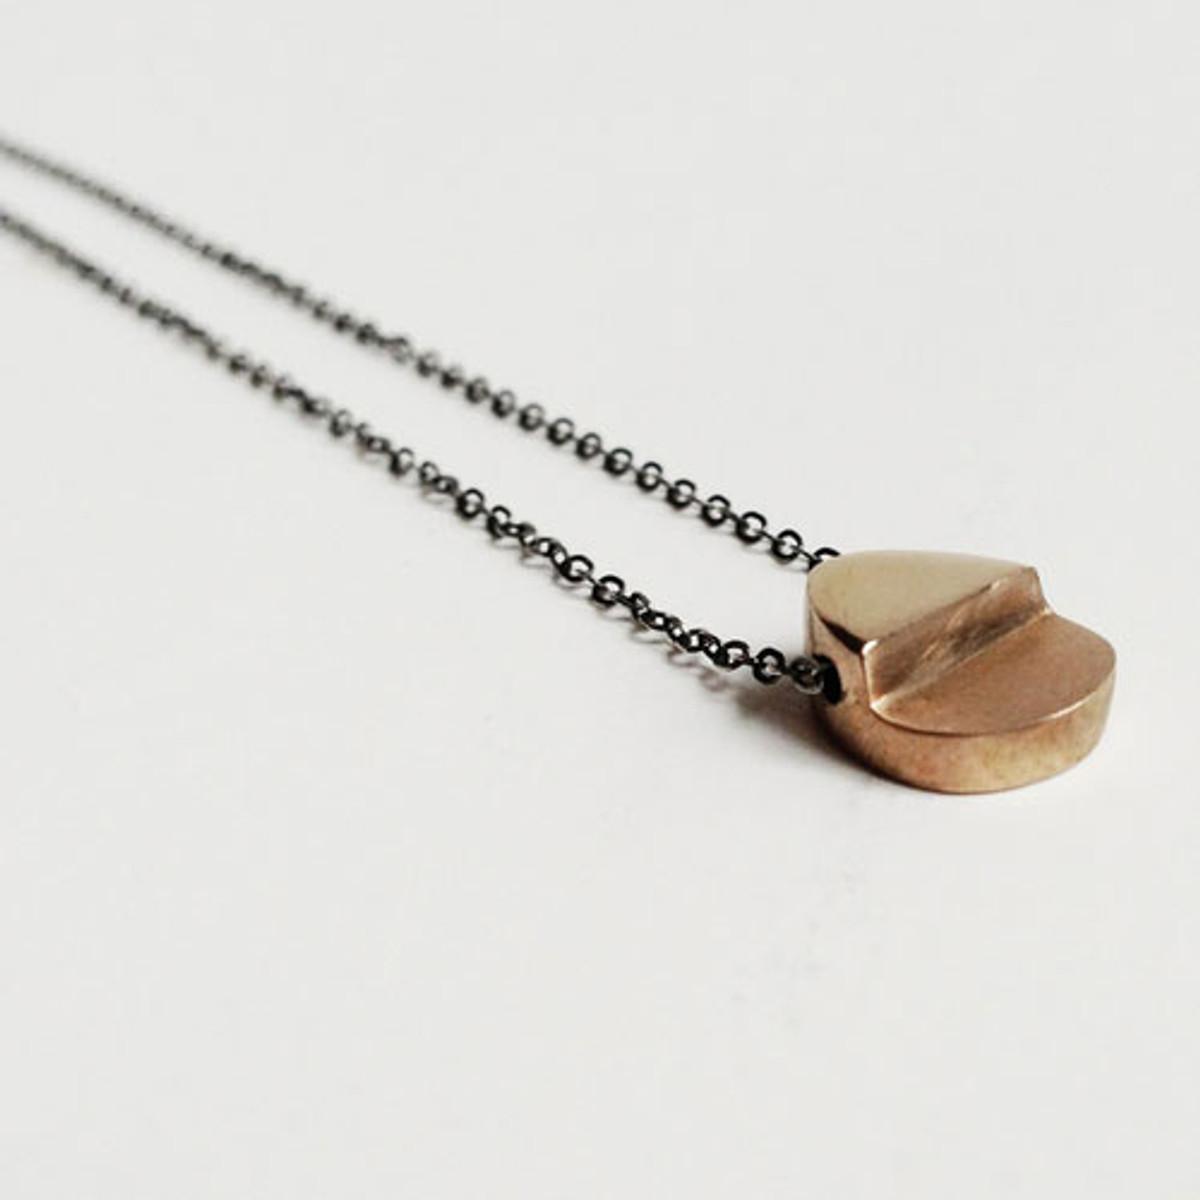 Artis Necklace